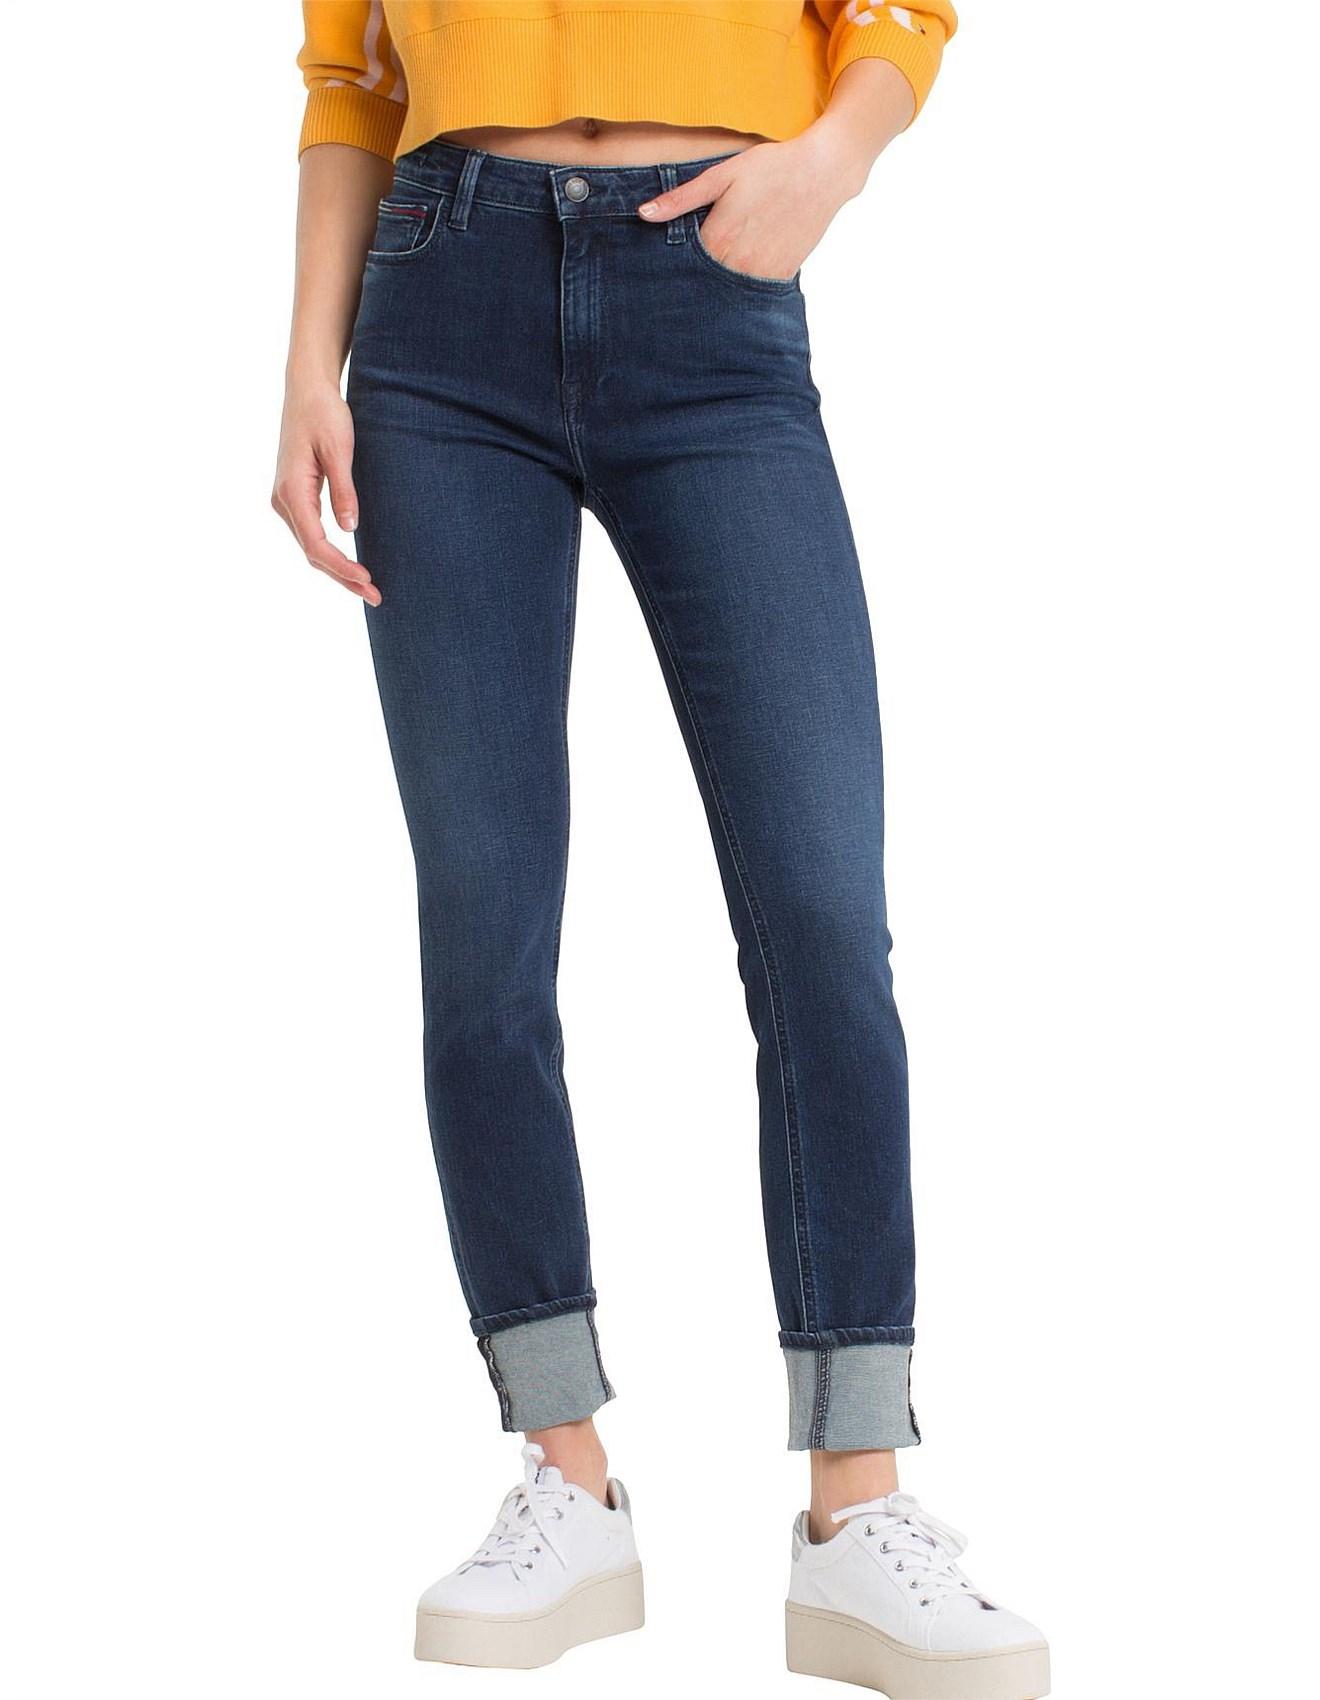 43f18a01 Women's Jeans Sale | Jeans Sale & Denim Sale | David Jones - High Rise  Skinny Santana Jean